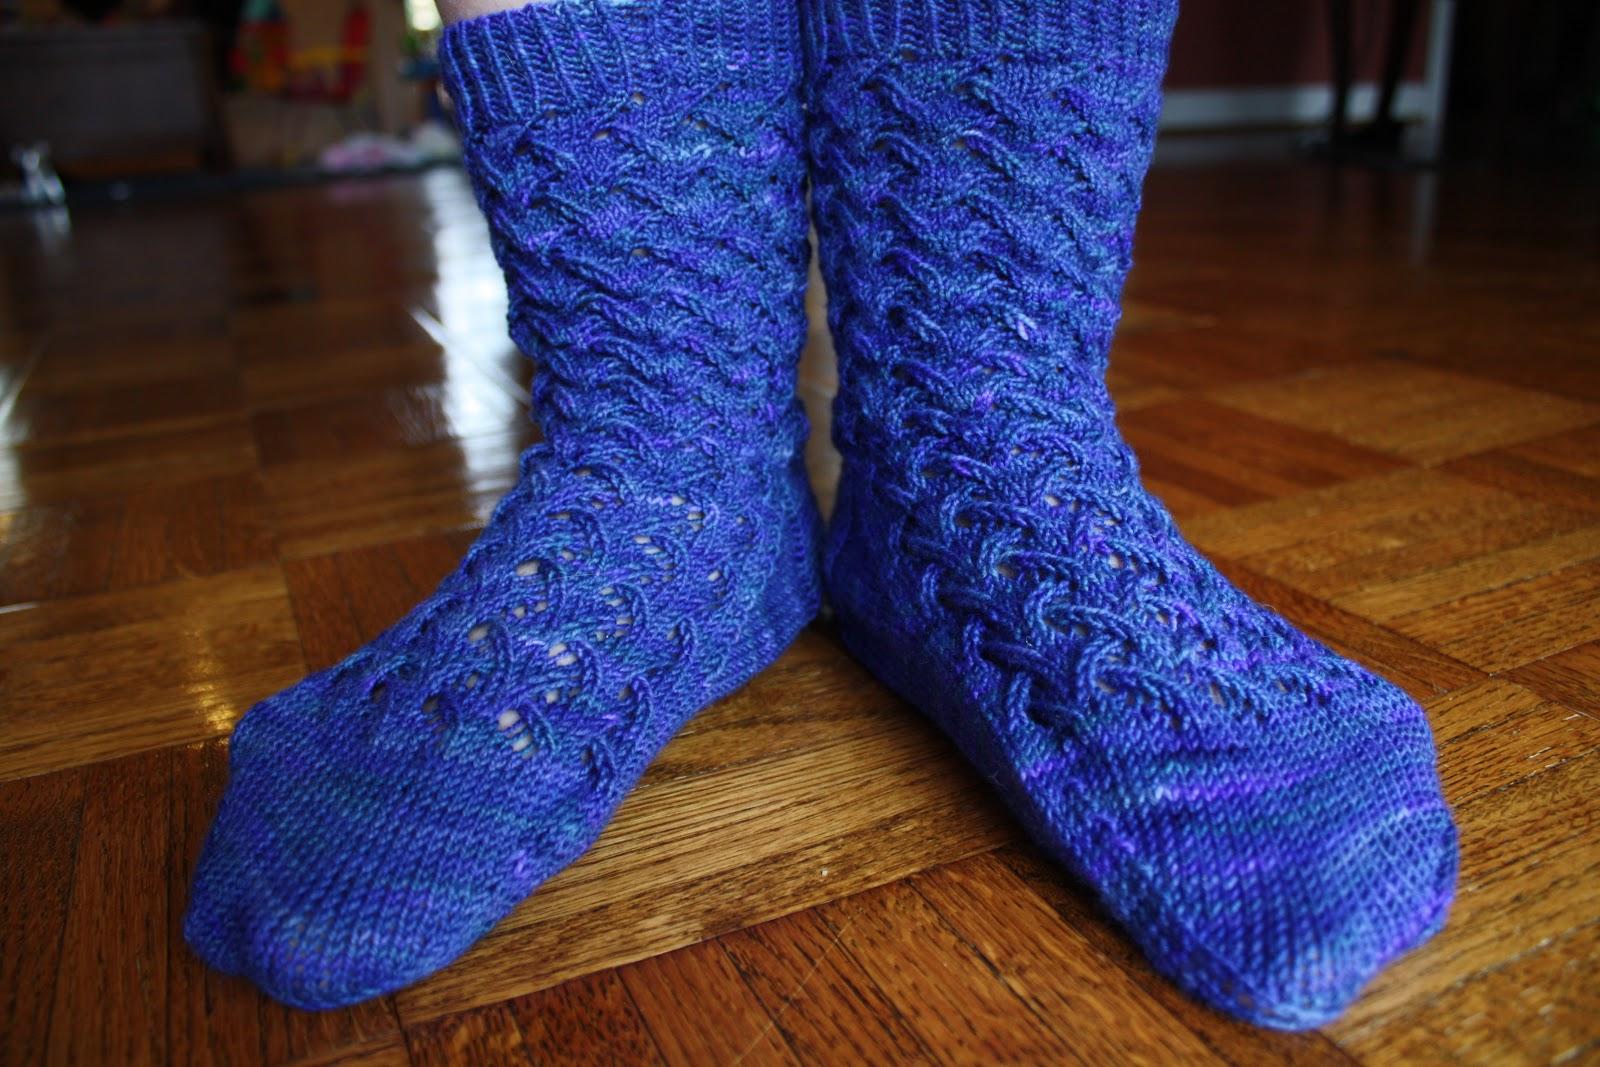 Grapevine Lace Knitting Pattern : snapdragon crafts: grapevine crosshatch lace socks